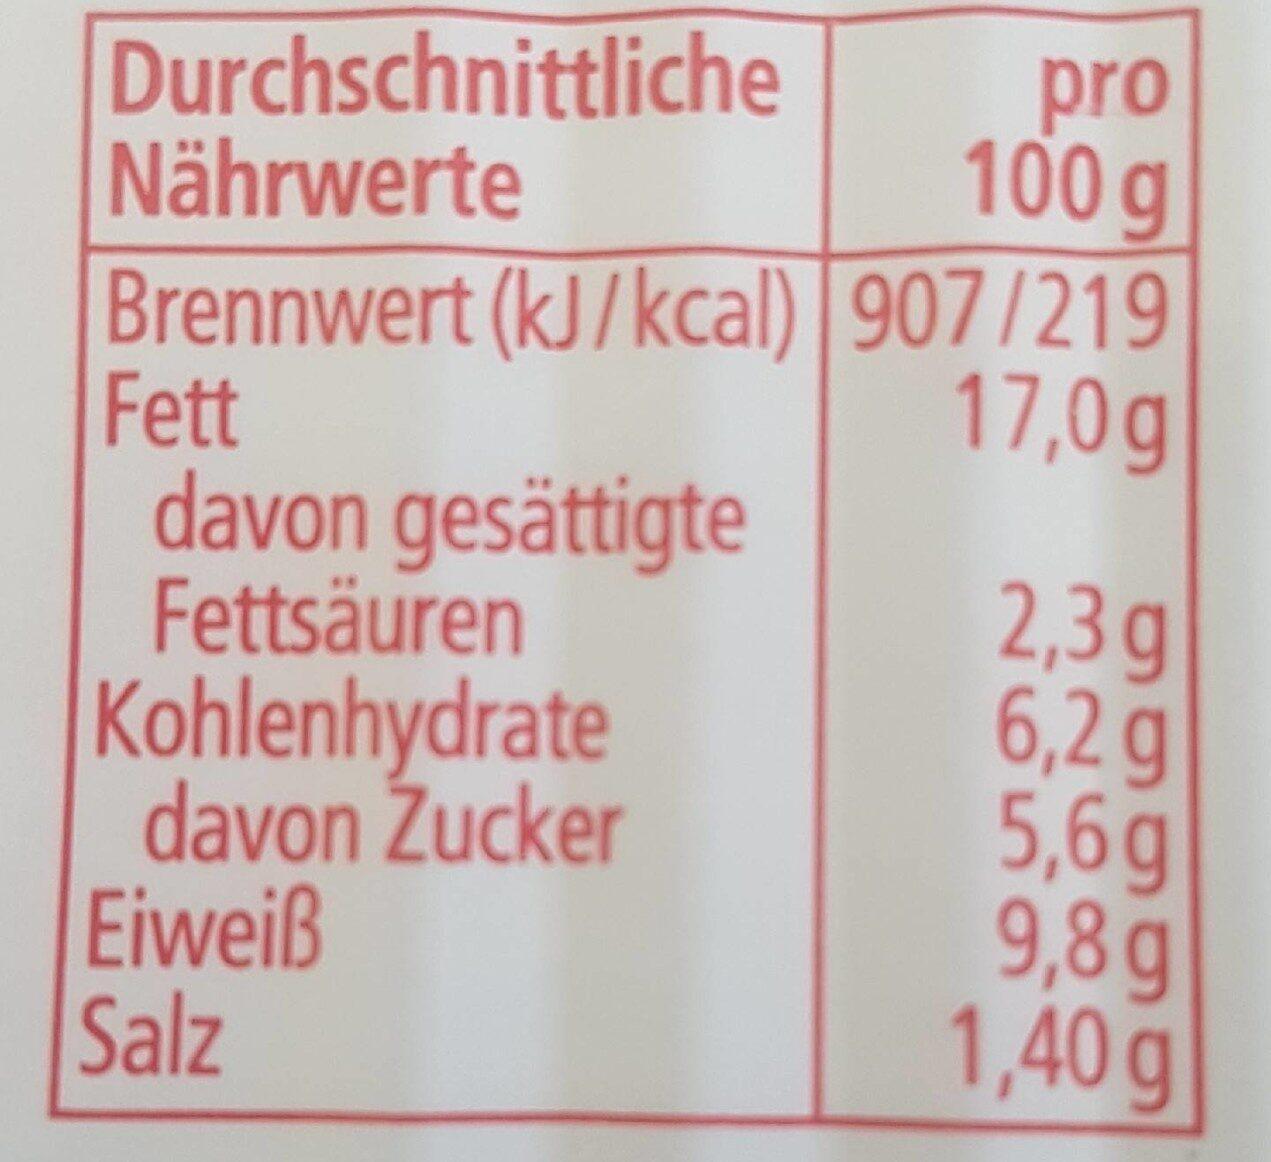 Heringsfilets in Tomatencreme - Nährwertangaben - de